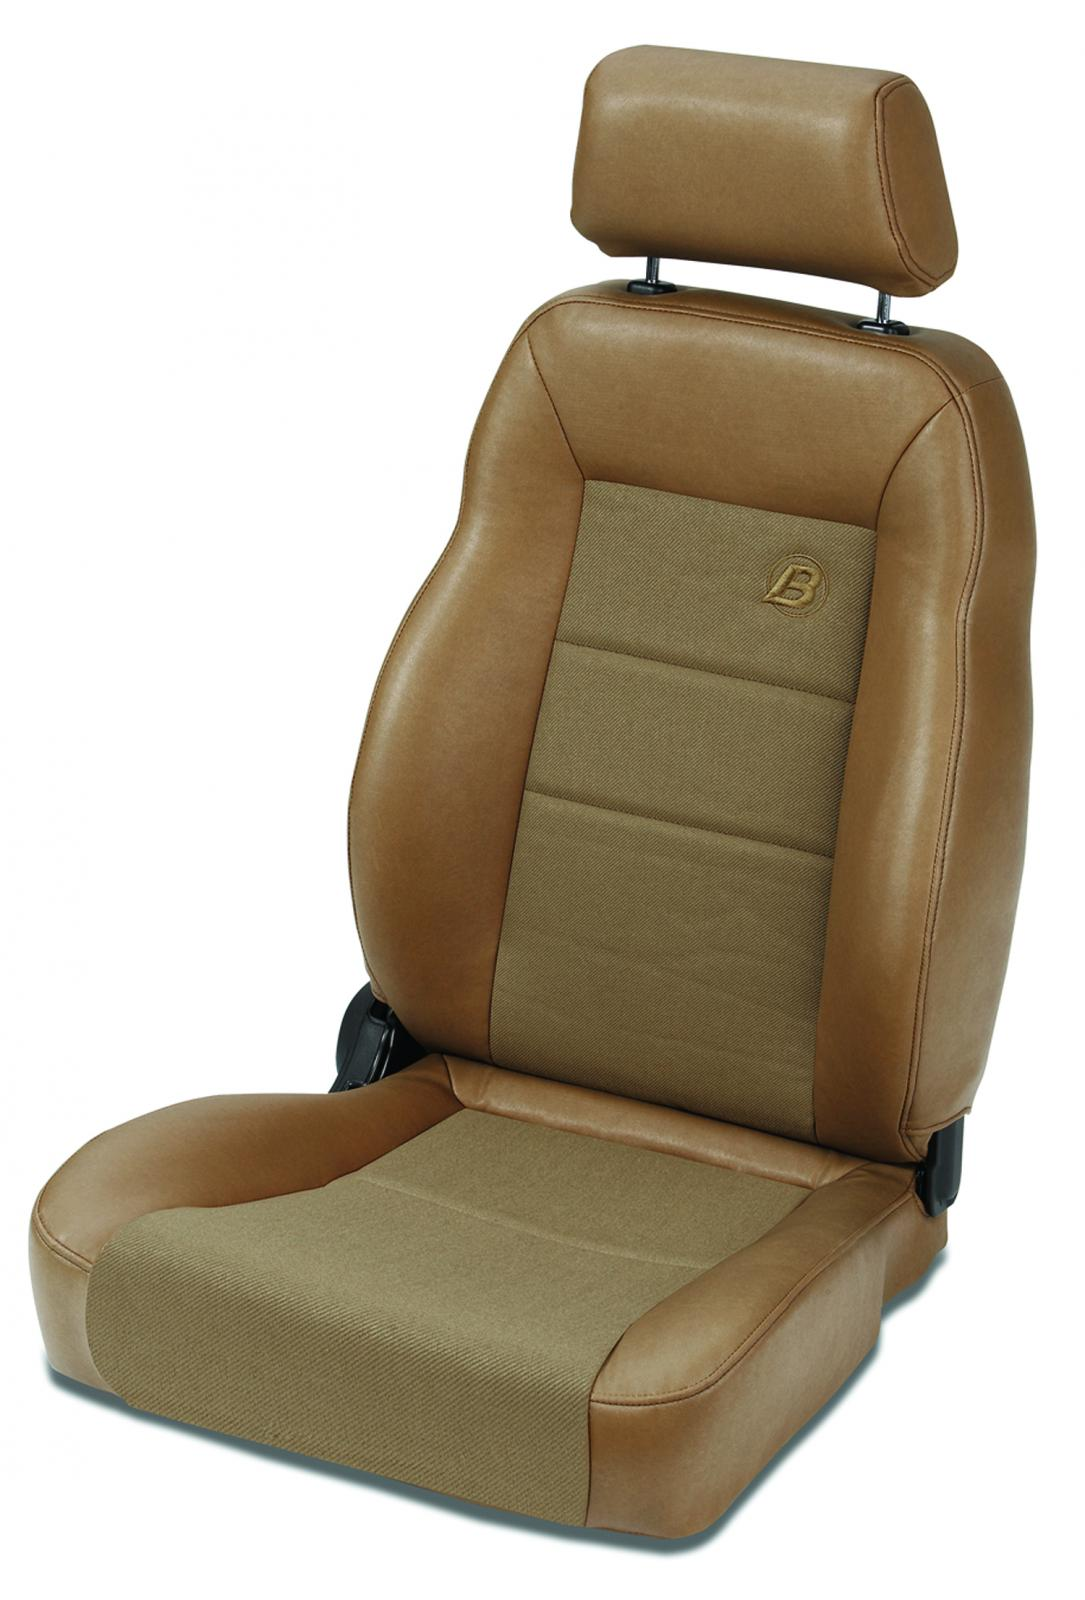 Bestop 39460-37 Fabric Spice Front Passenger Side Trailmax II Pro Front Seat Jeep CJ-7   Wrangler YJ 1976-2006